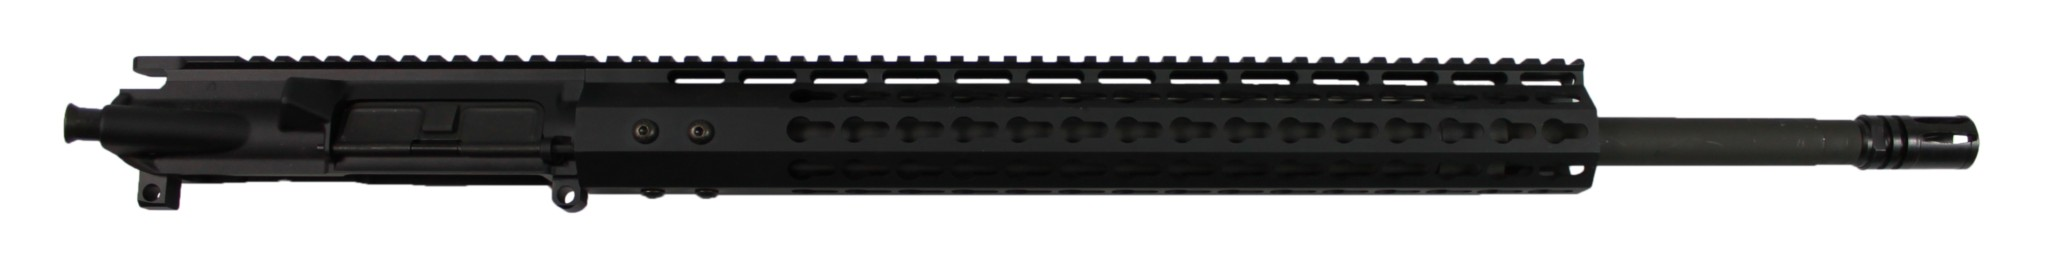 ar 15 blemished upper assembly 20 223 5 56 15 cbc arms gen 2 keymod ar 15 handguard rail